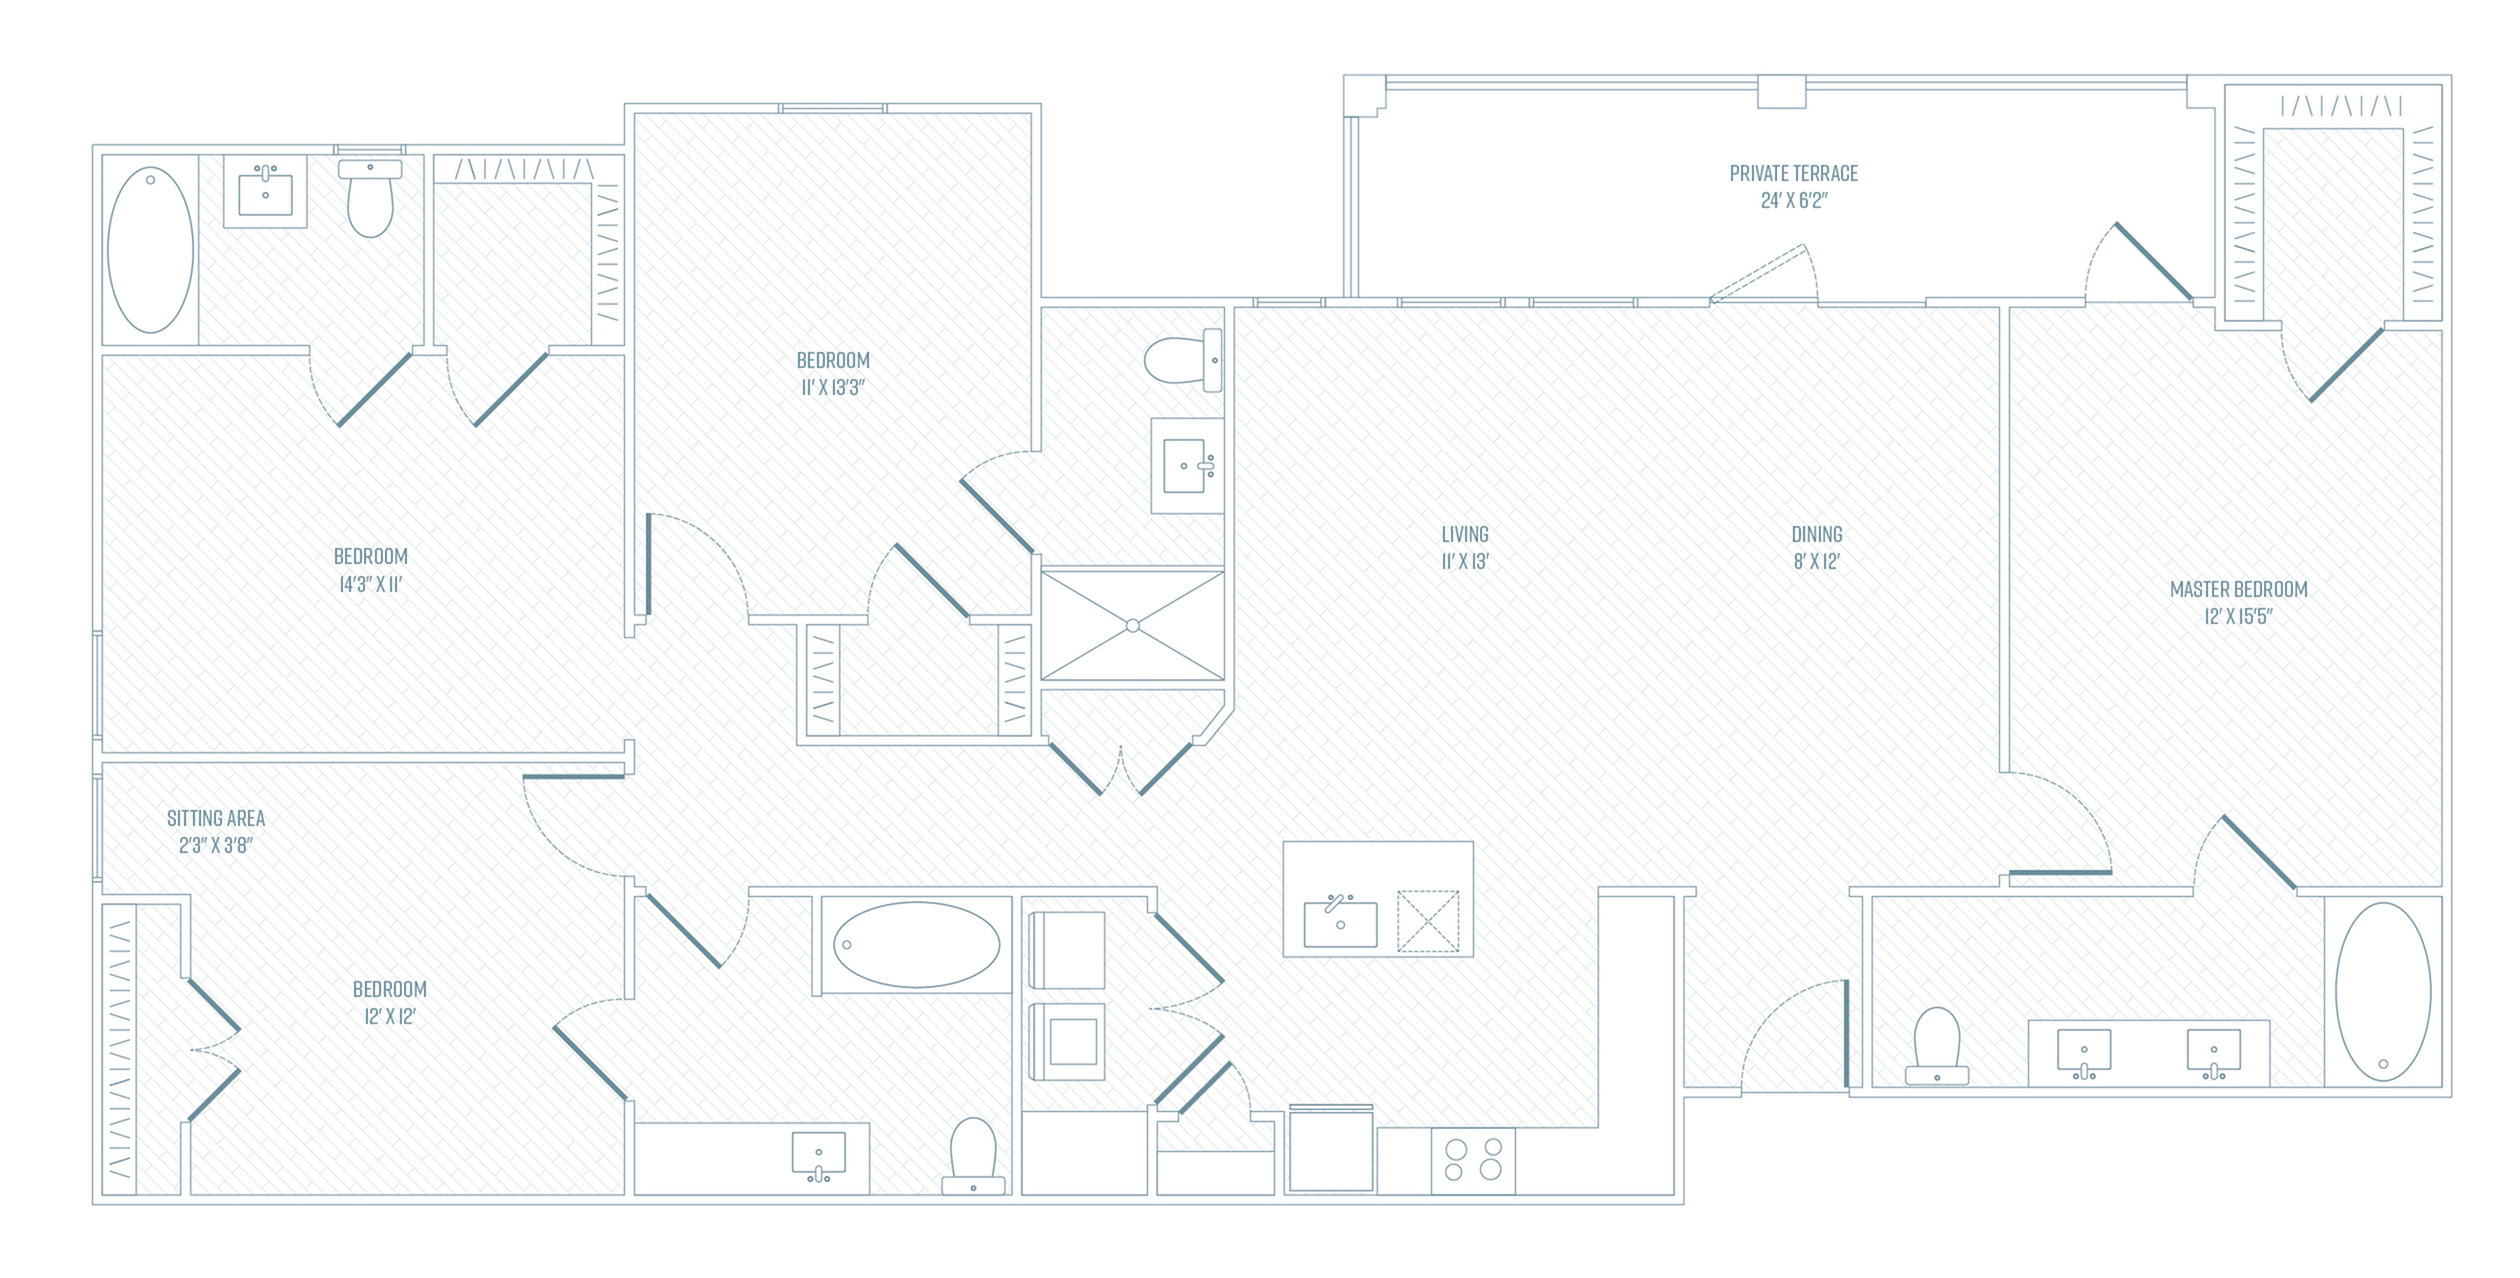 4 Bedroom Floor Plan | Apartments In Farmers Branch TX | Luxe at Mercer Crossing